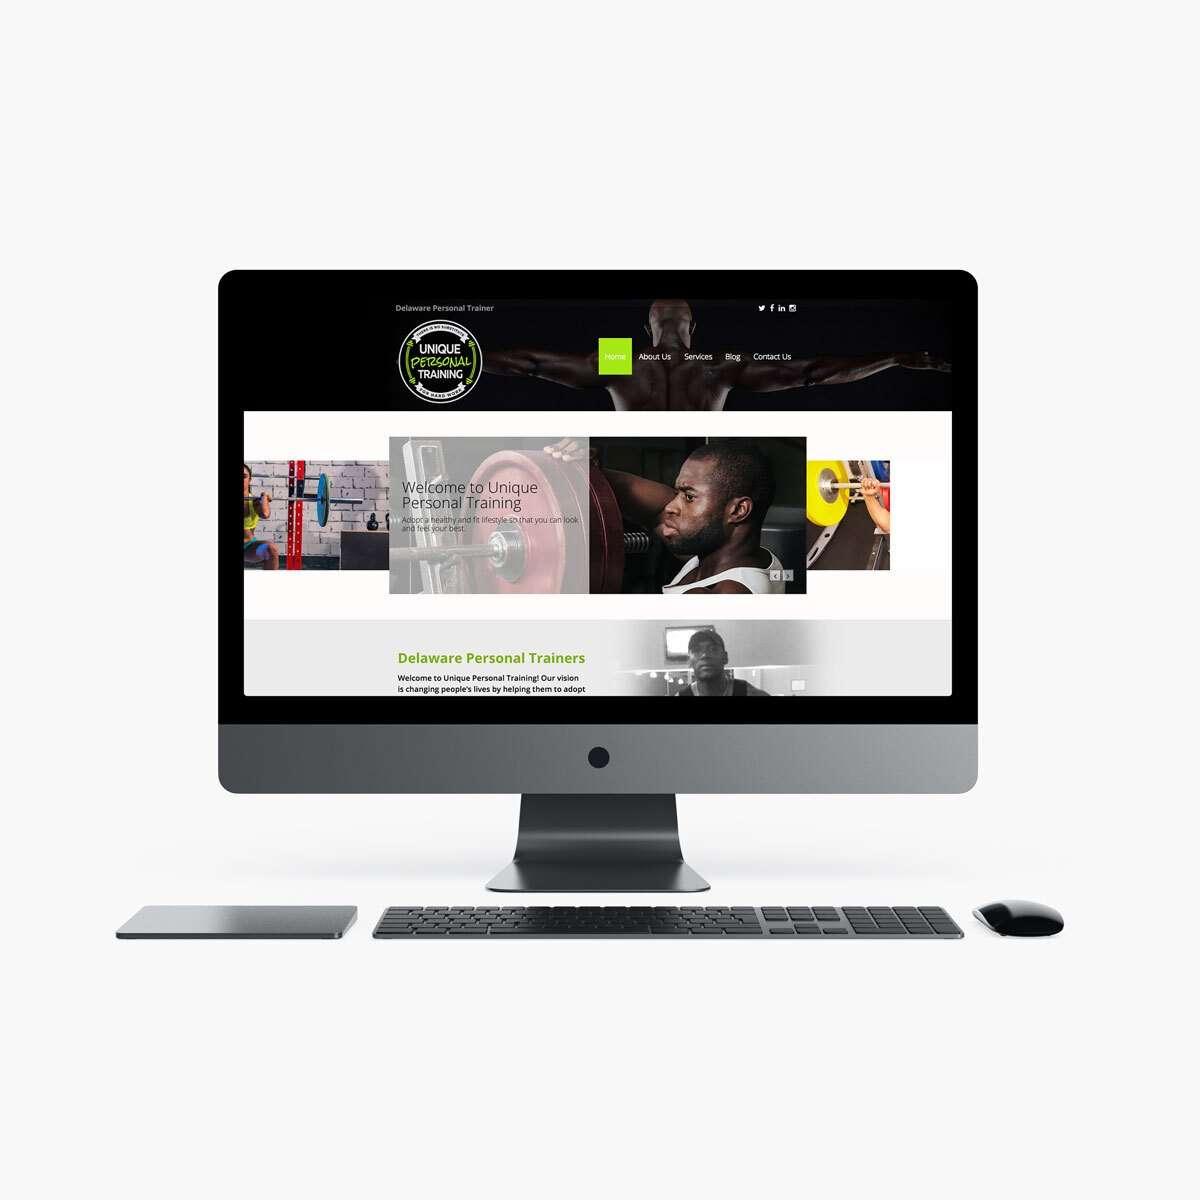 Unique Personal Training Web Design by BrandSwan, a web design company